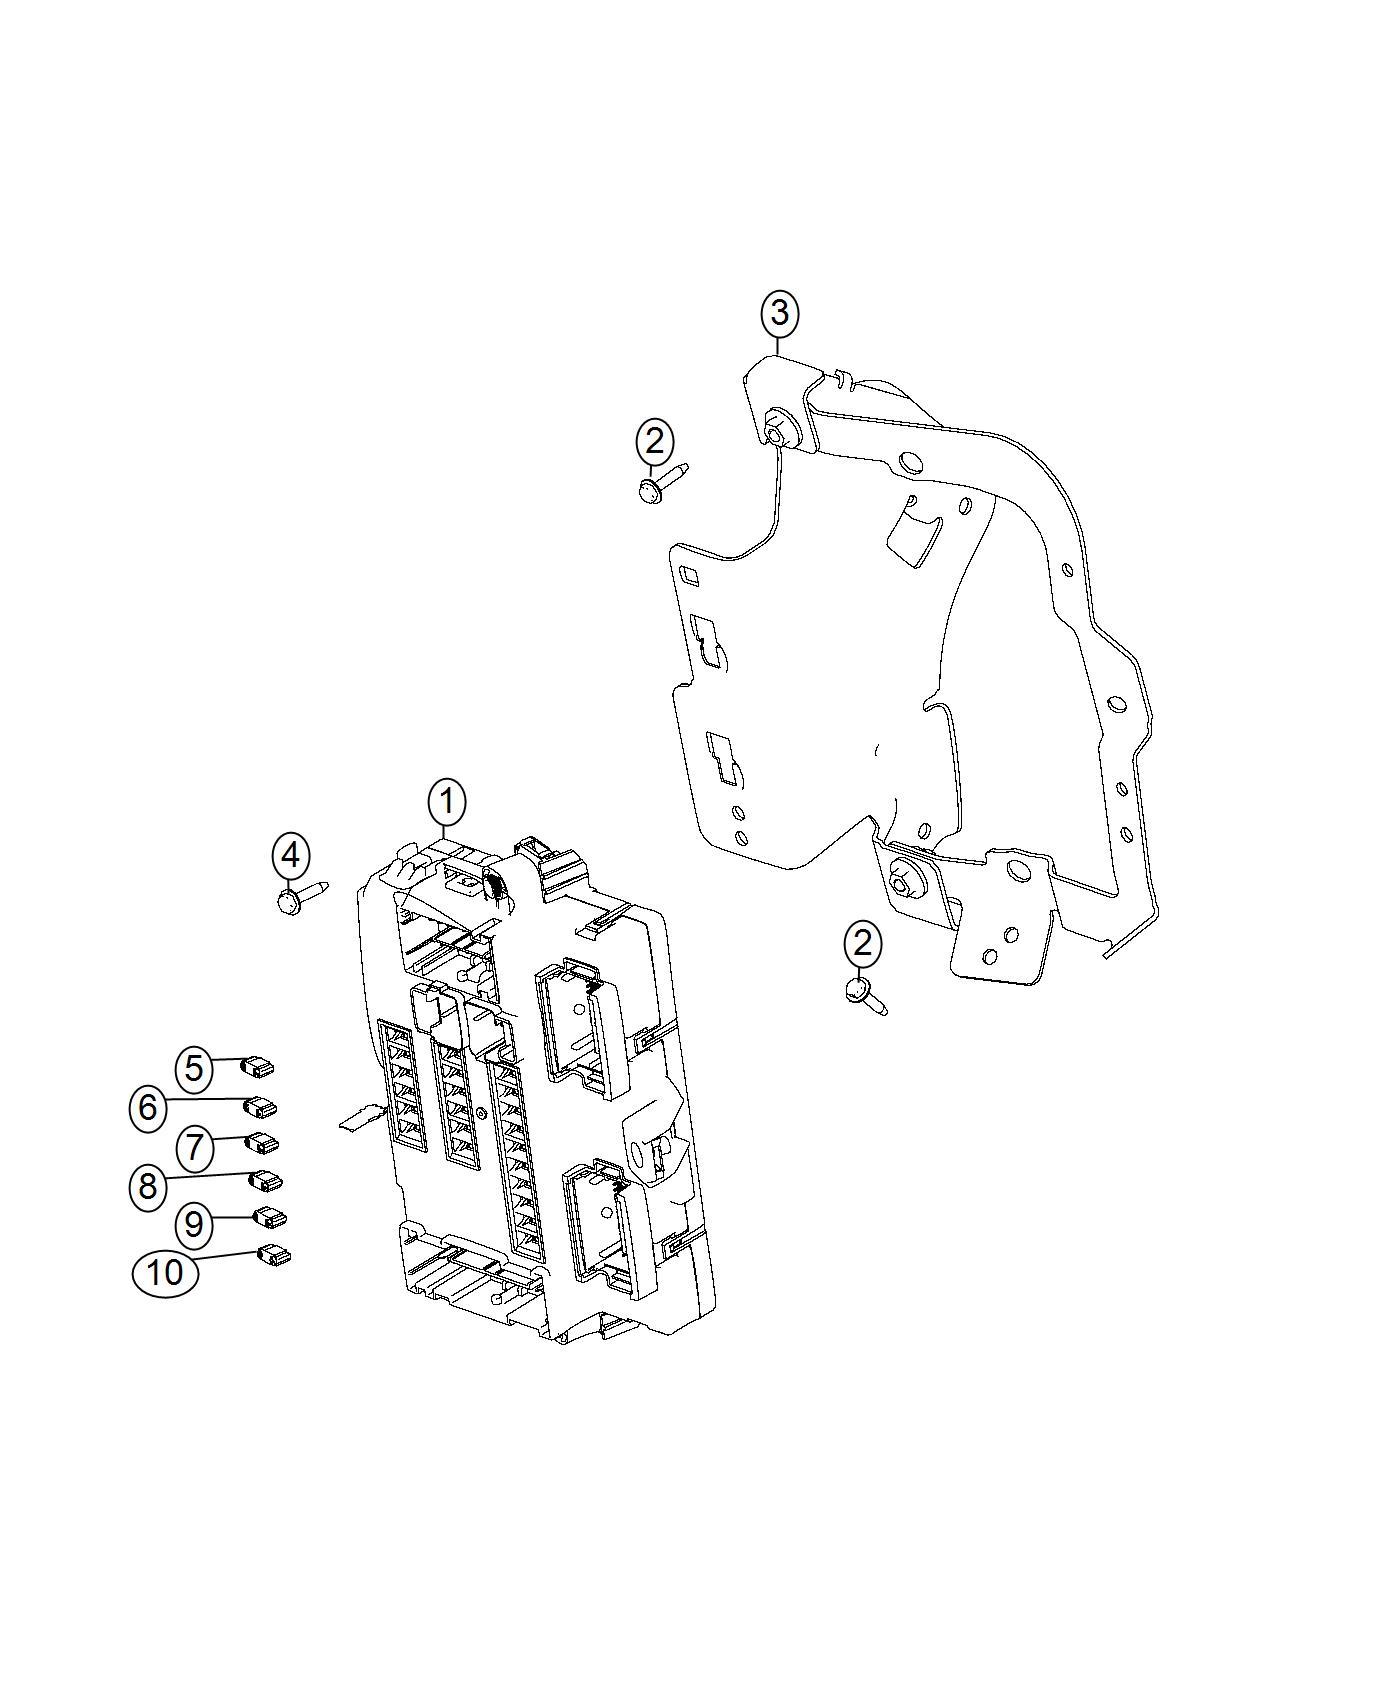 2016 Dodge Dart Module. Body controller. [high intensity